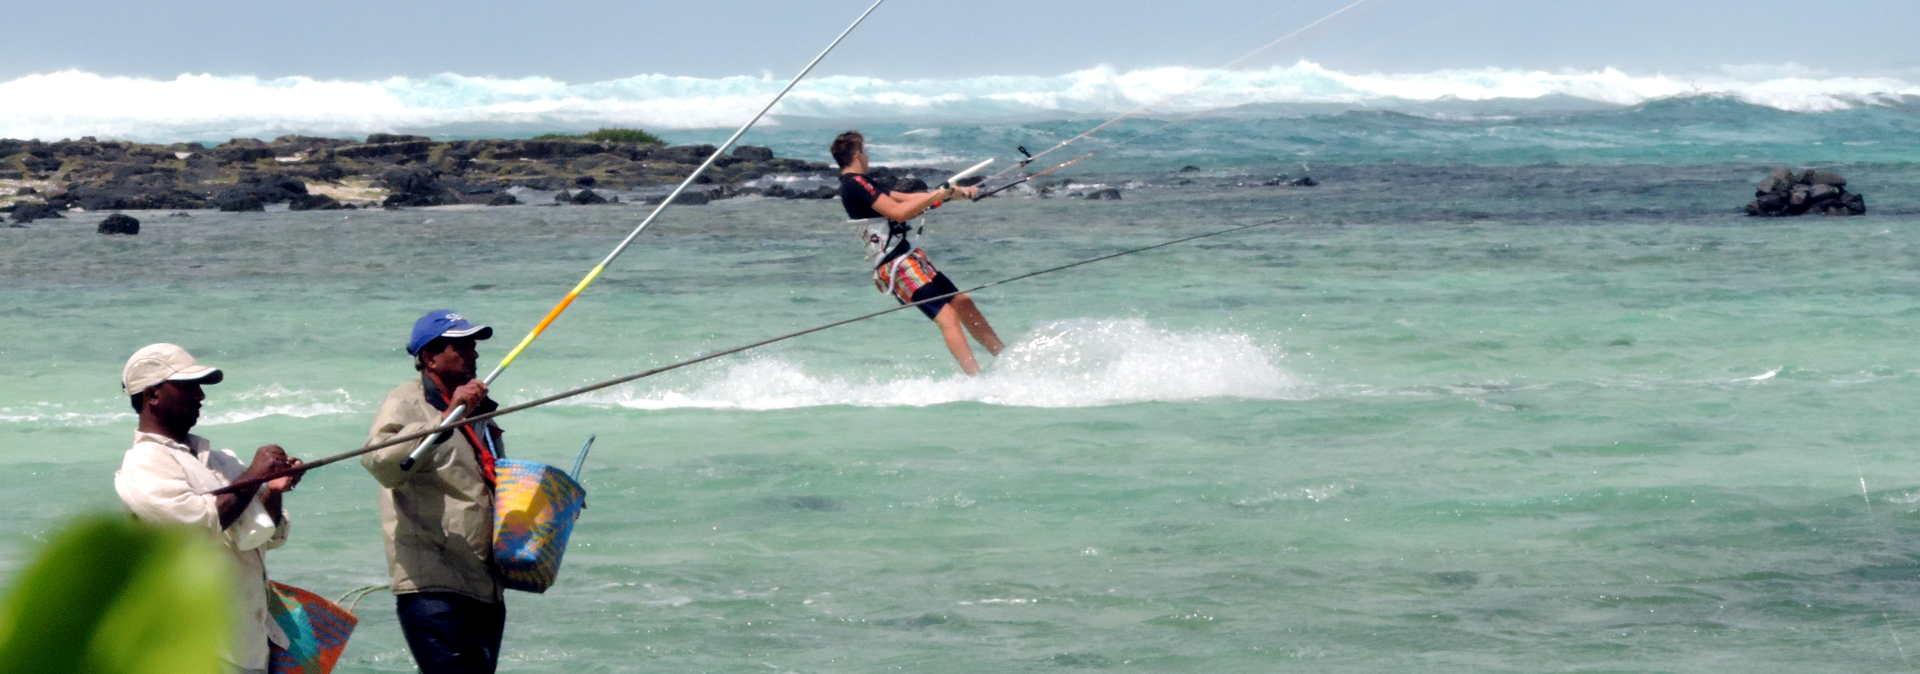 Kitesurfing-poste-lafayette-mauricio